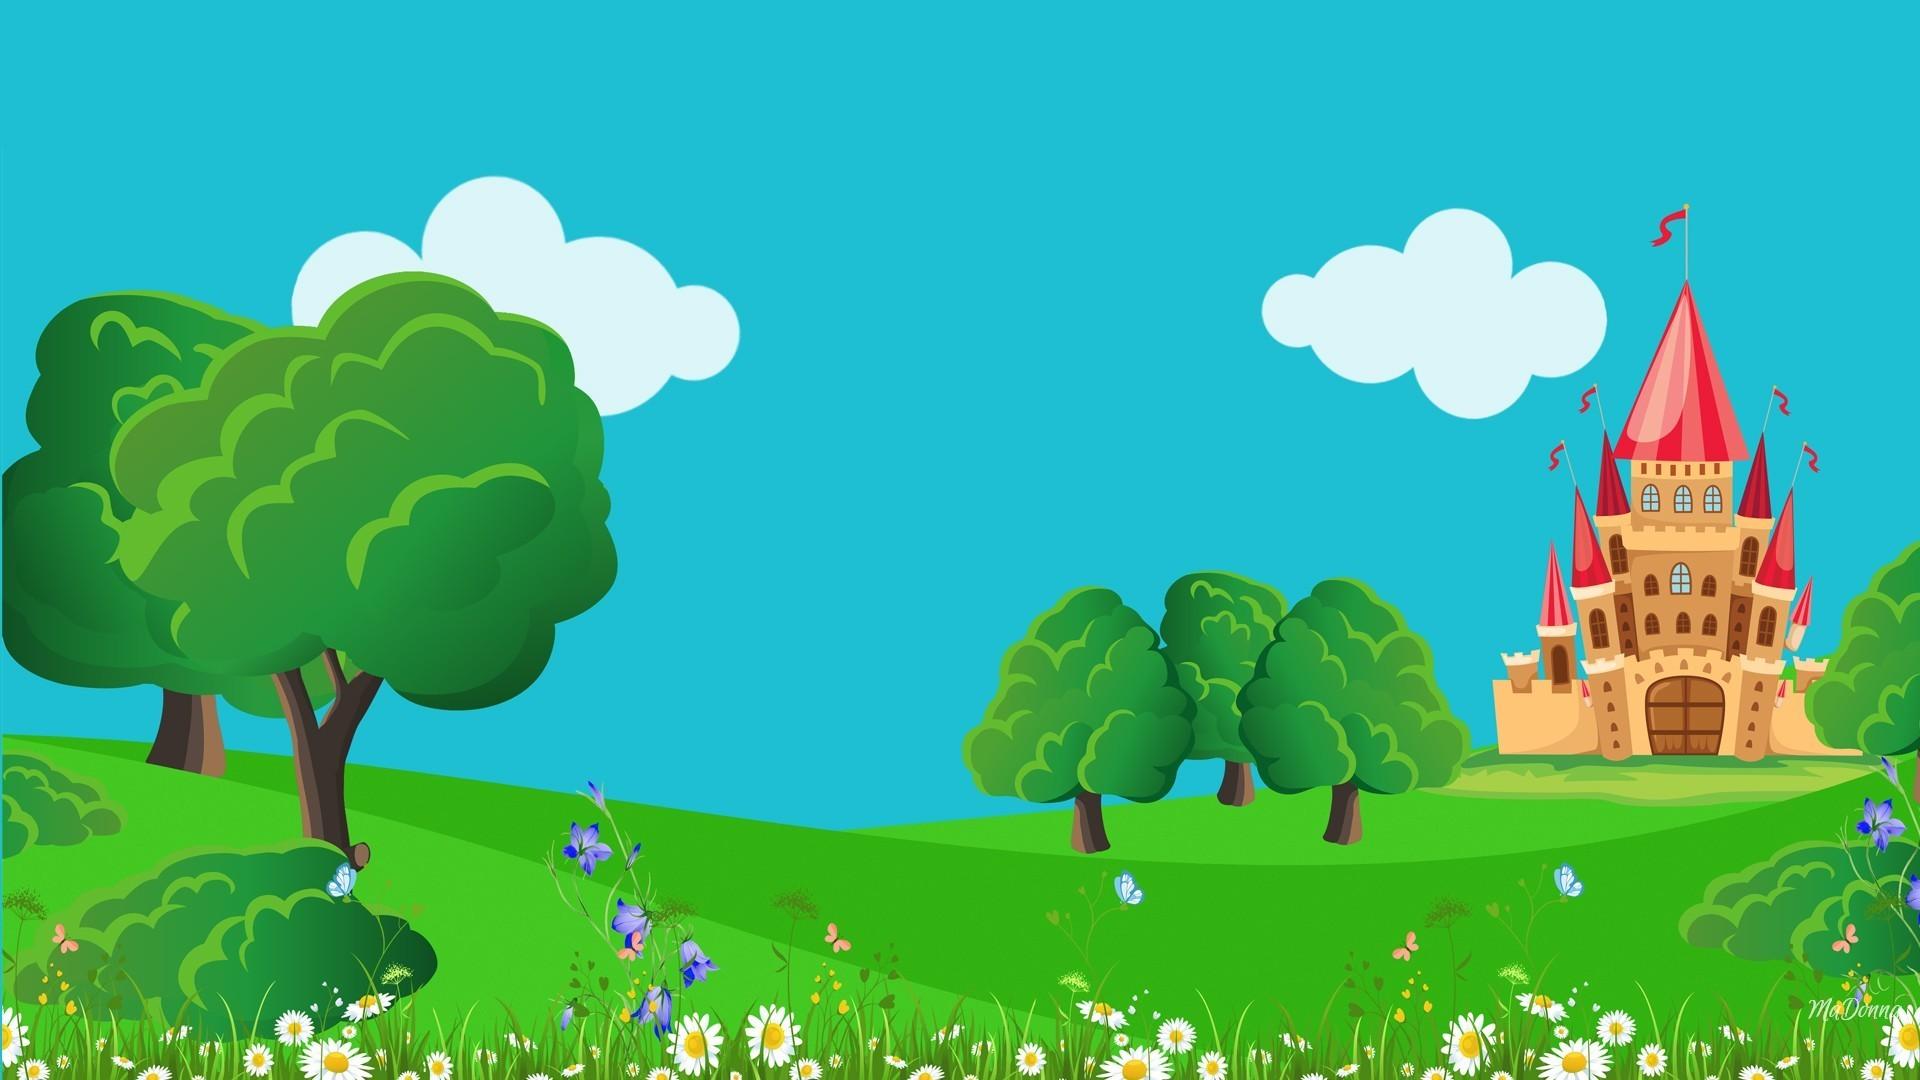 Tale Tag - Fairytale Castle Background - HD Wallpaper